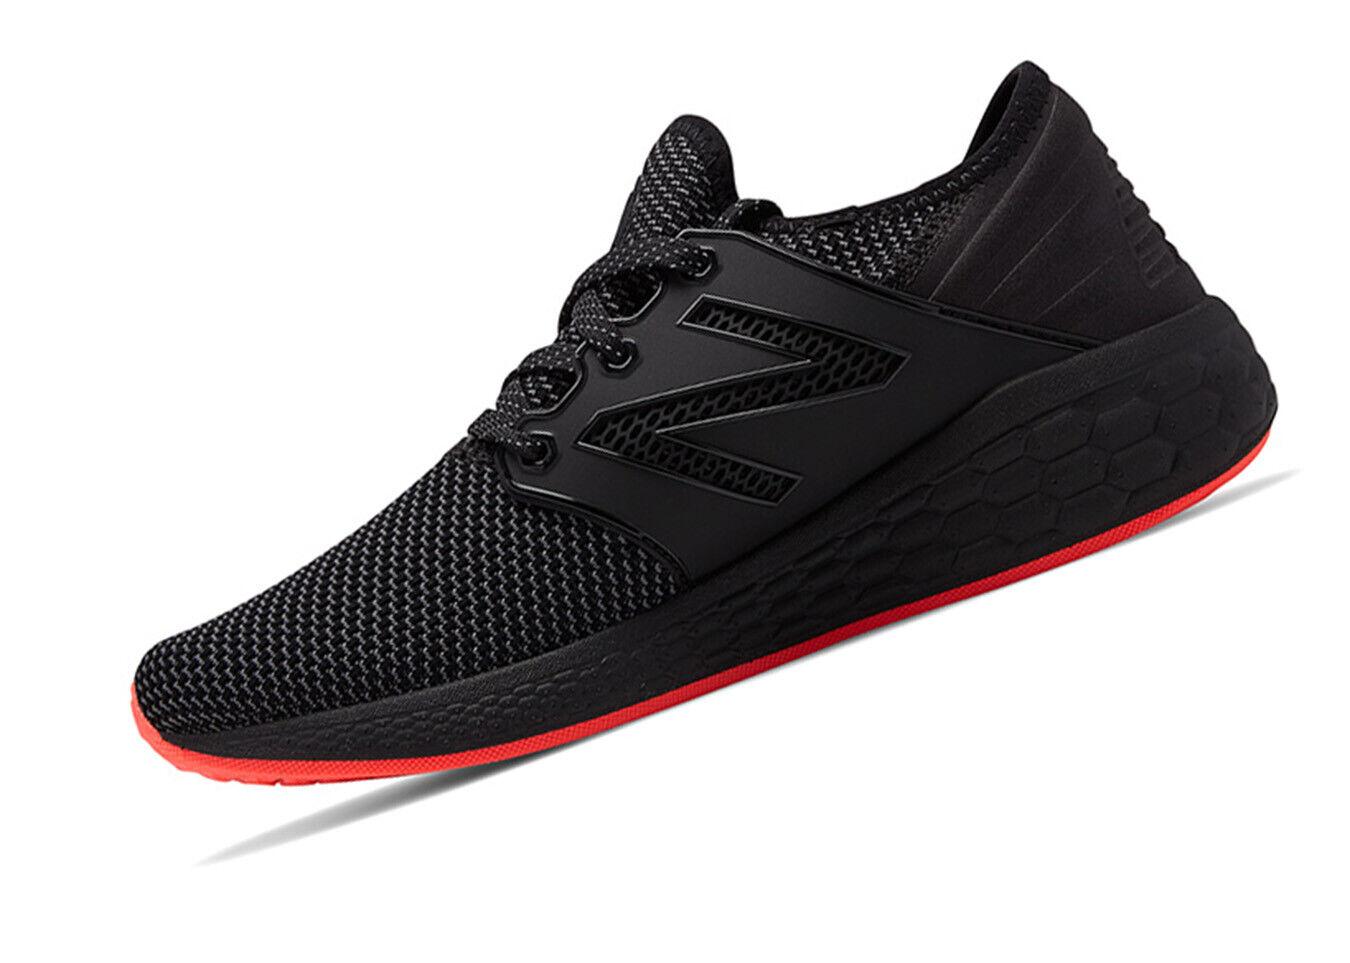 New balance cruz running wcruzrb 2 negro mujer fashion Lifestyle zapatos nuevo